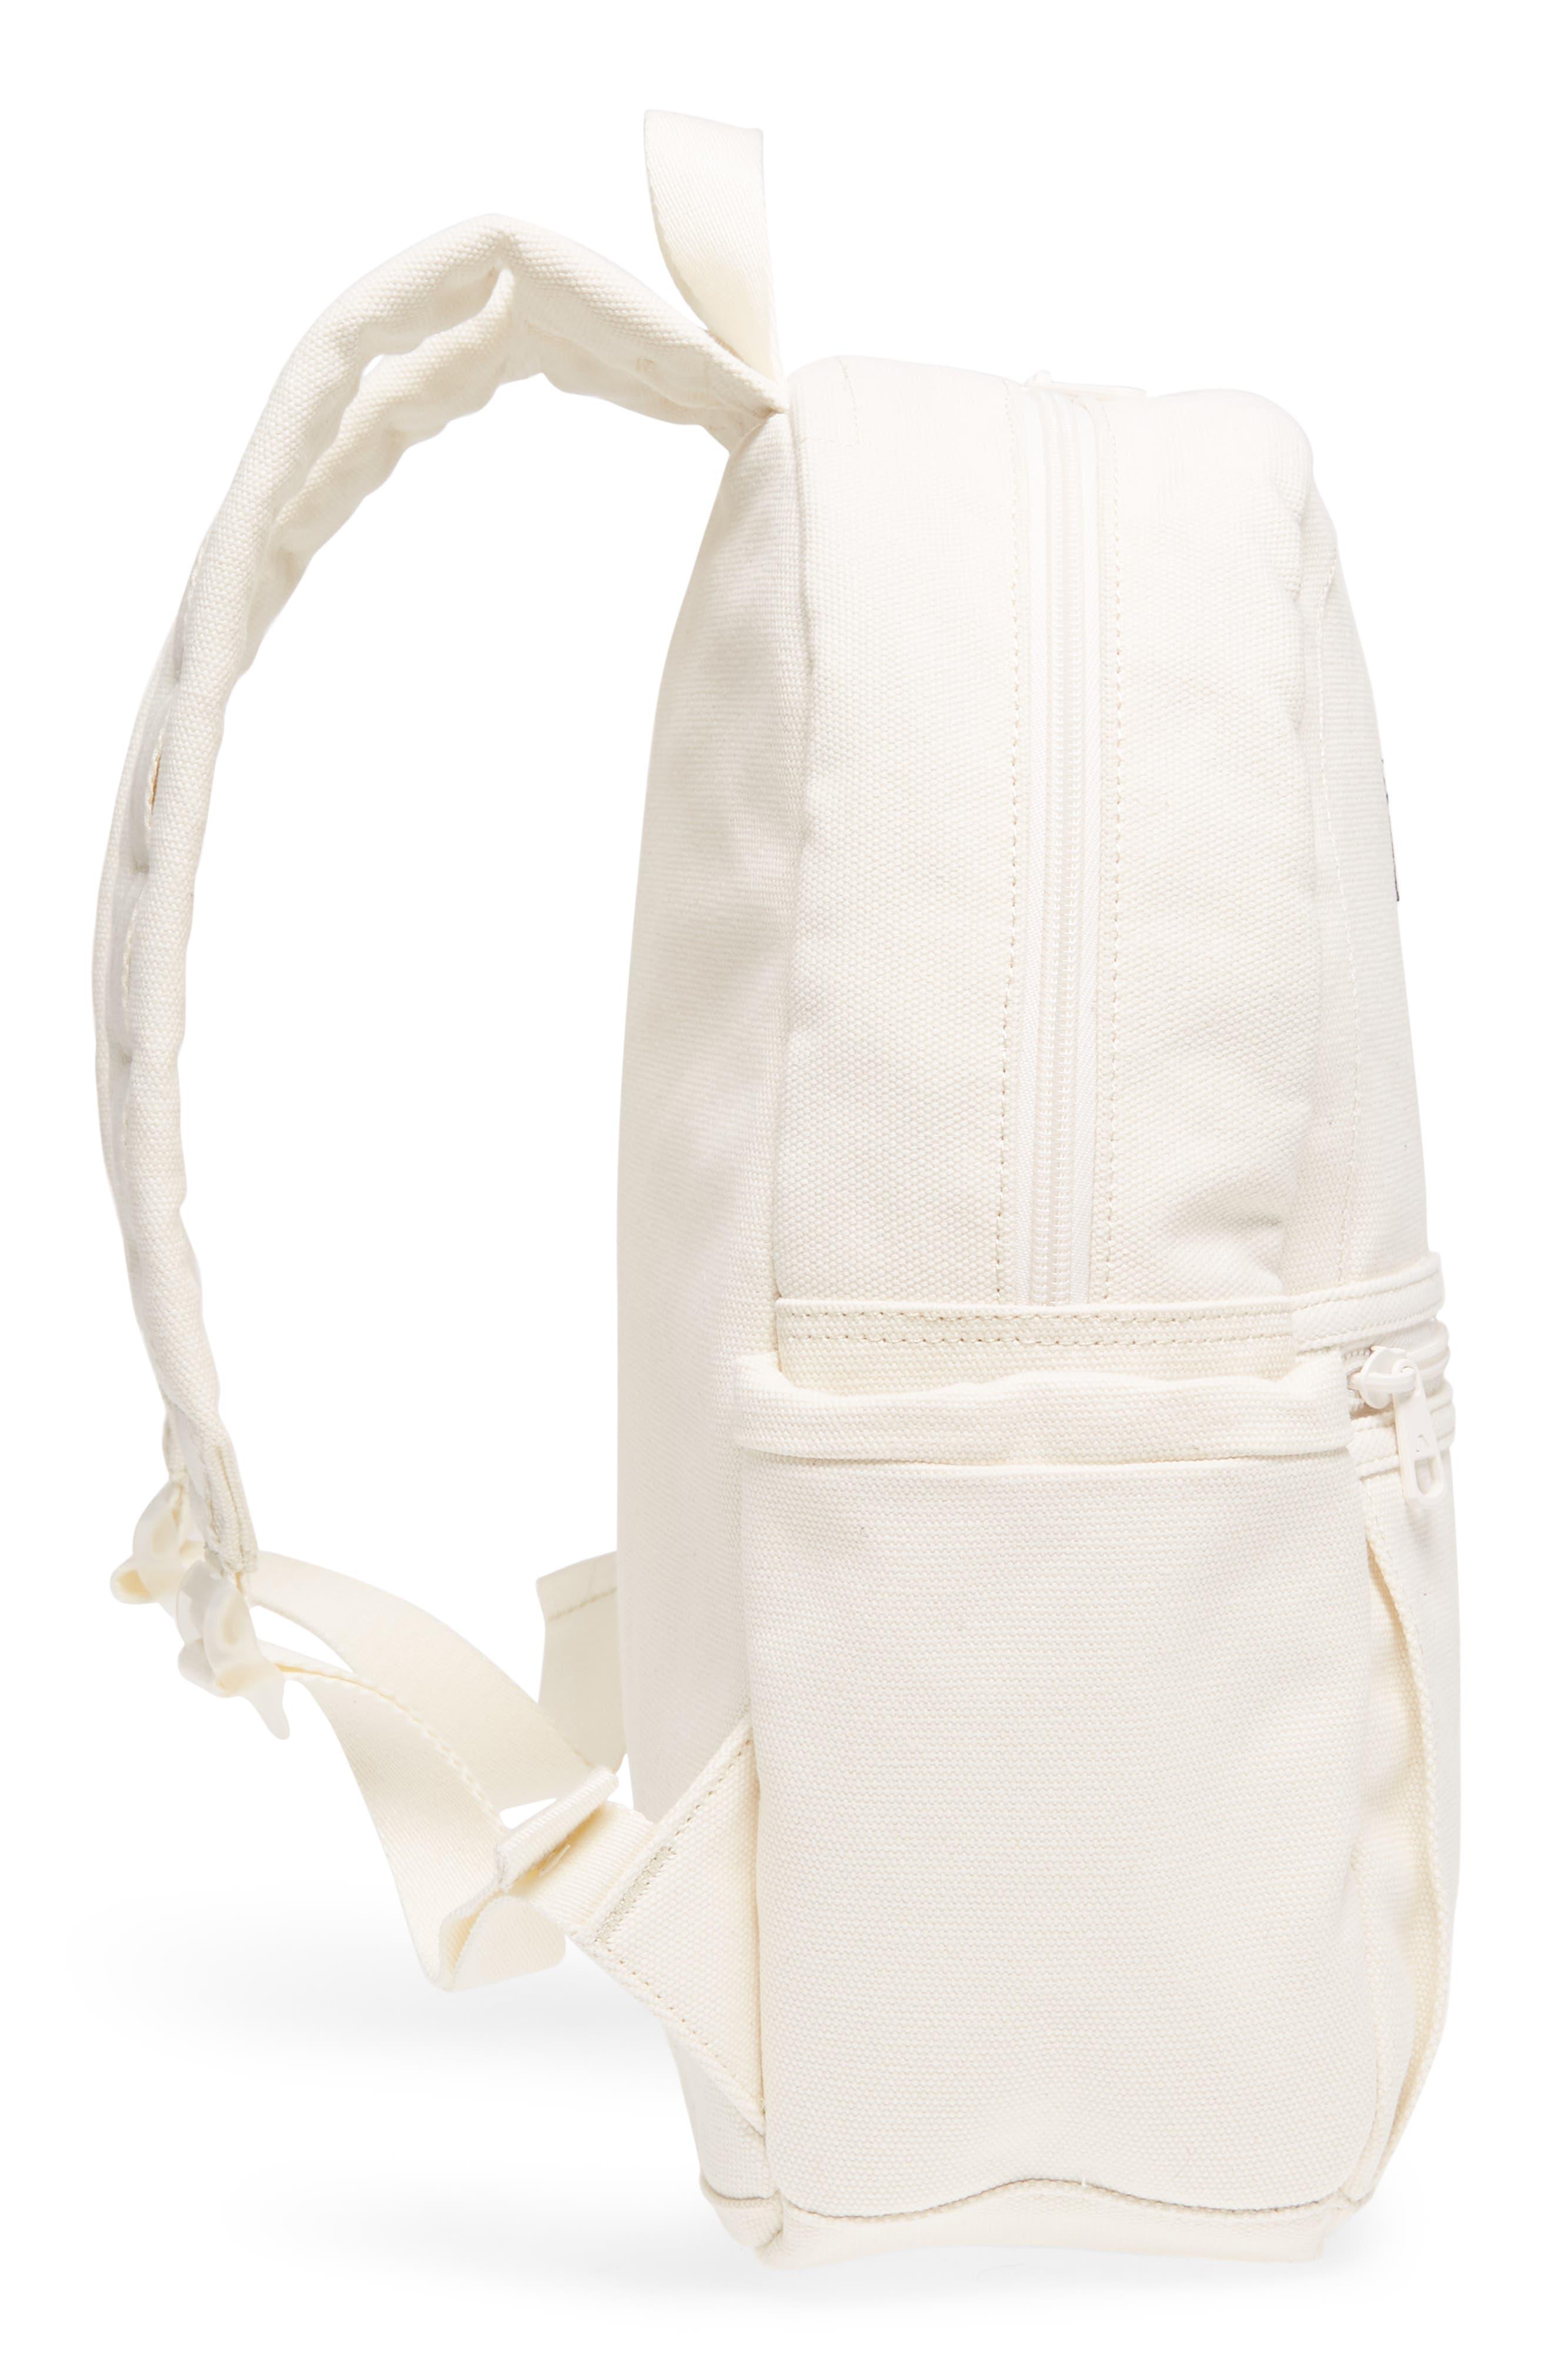 Kensington Kane Canvas Backpack,                             Alternate thumbnail 5, color,                             Natural